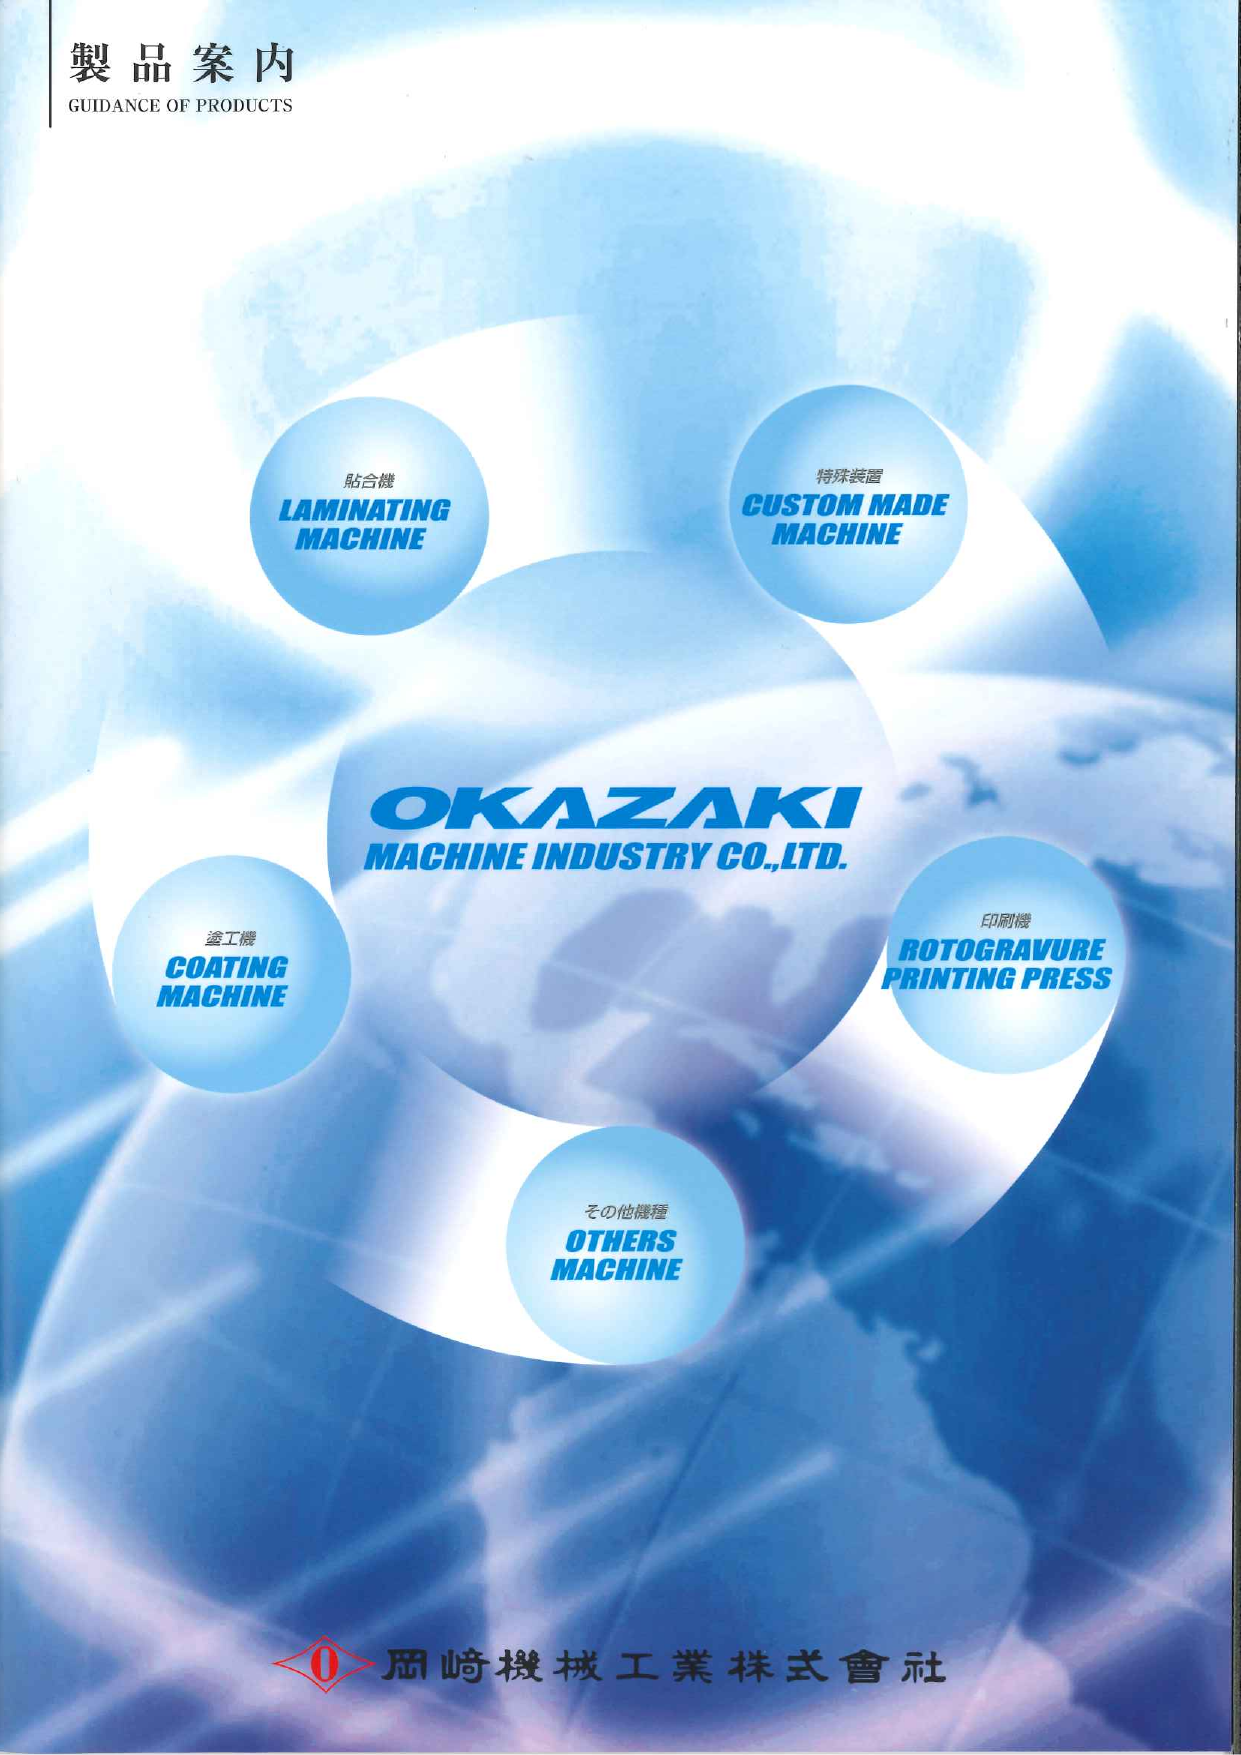 貼合機・塗工機 岡崎機械工業 総合カタログ